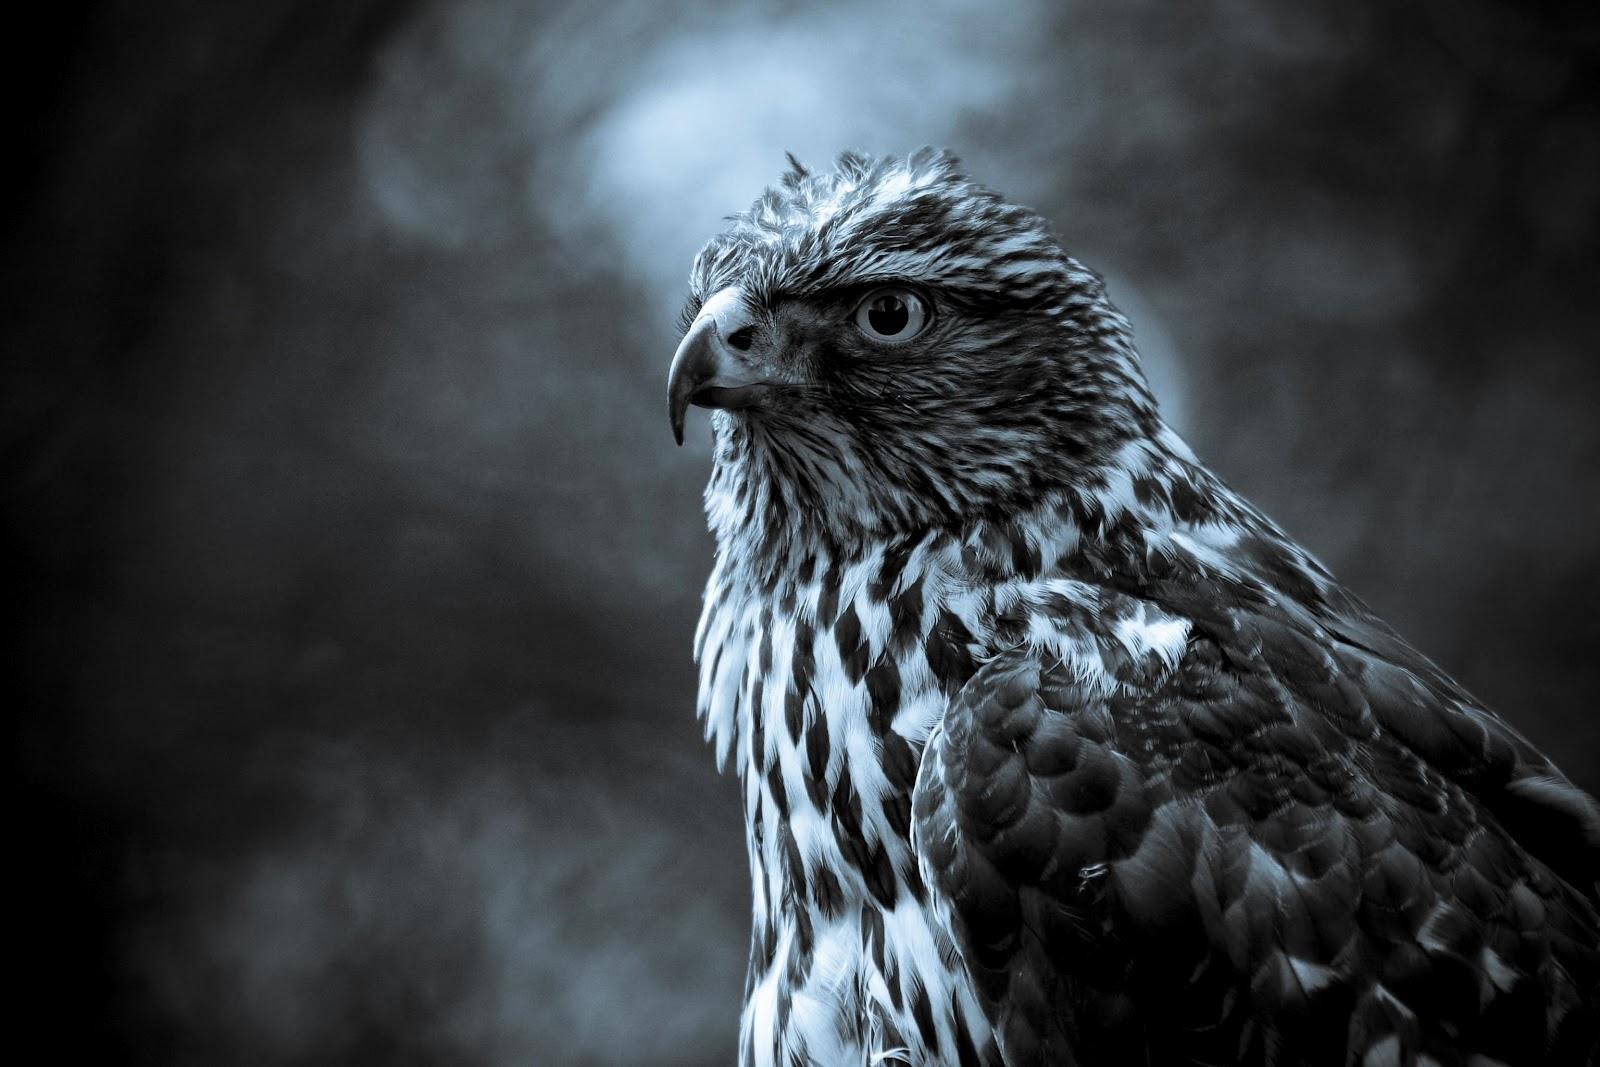 Beautiful Wallpaper Night Animal - resting-in-the-night-sky-eagle-animal-wallpaper  HD.jpg